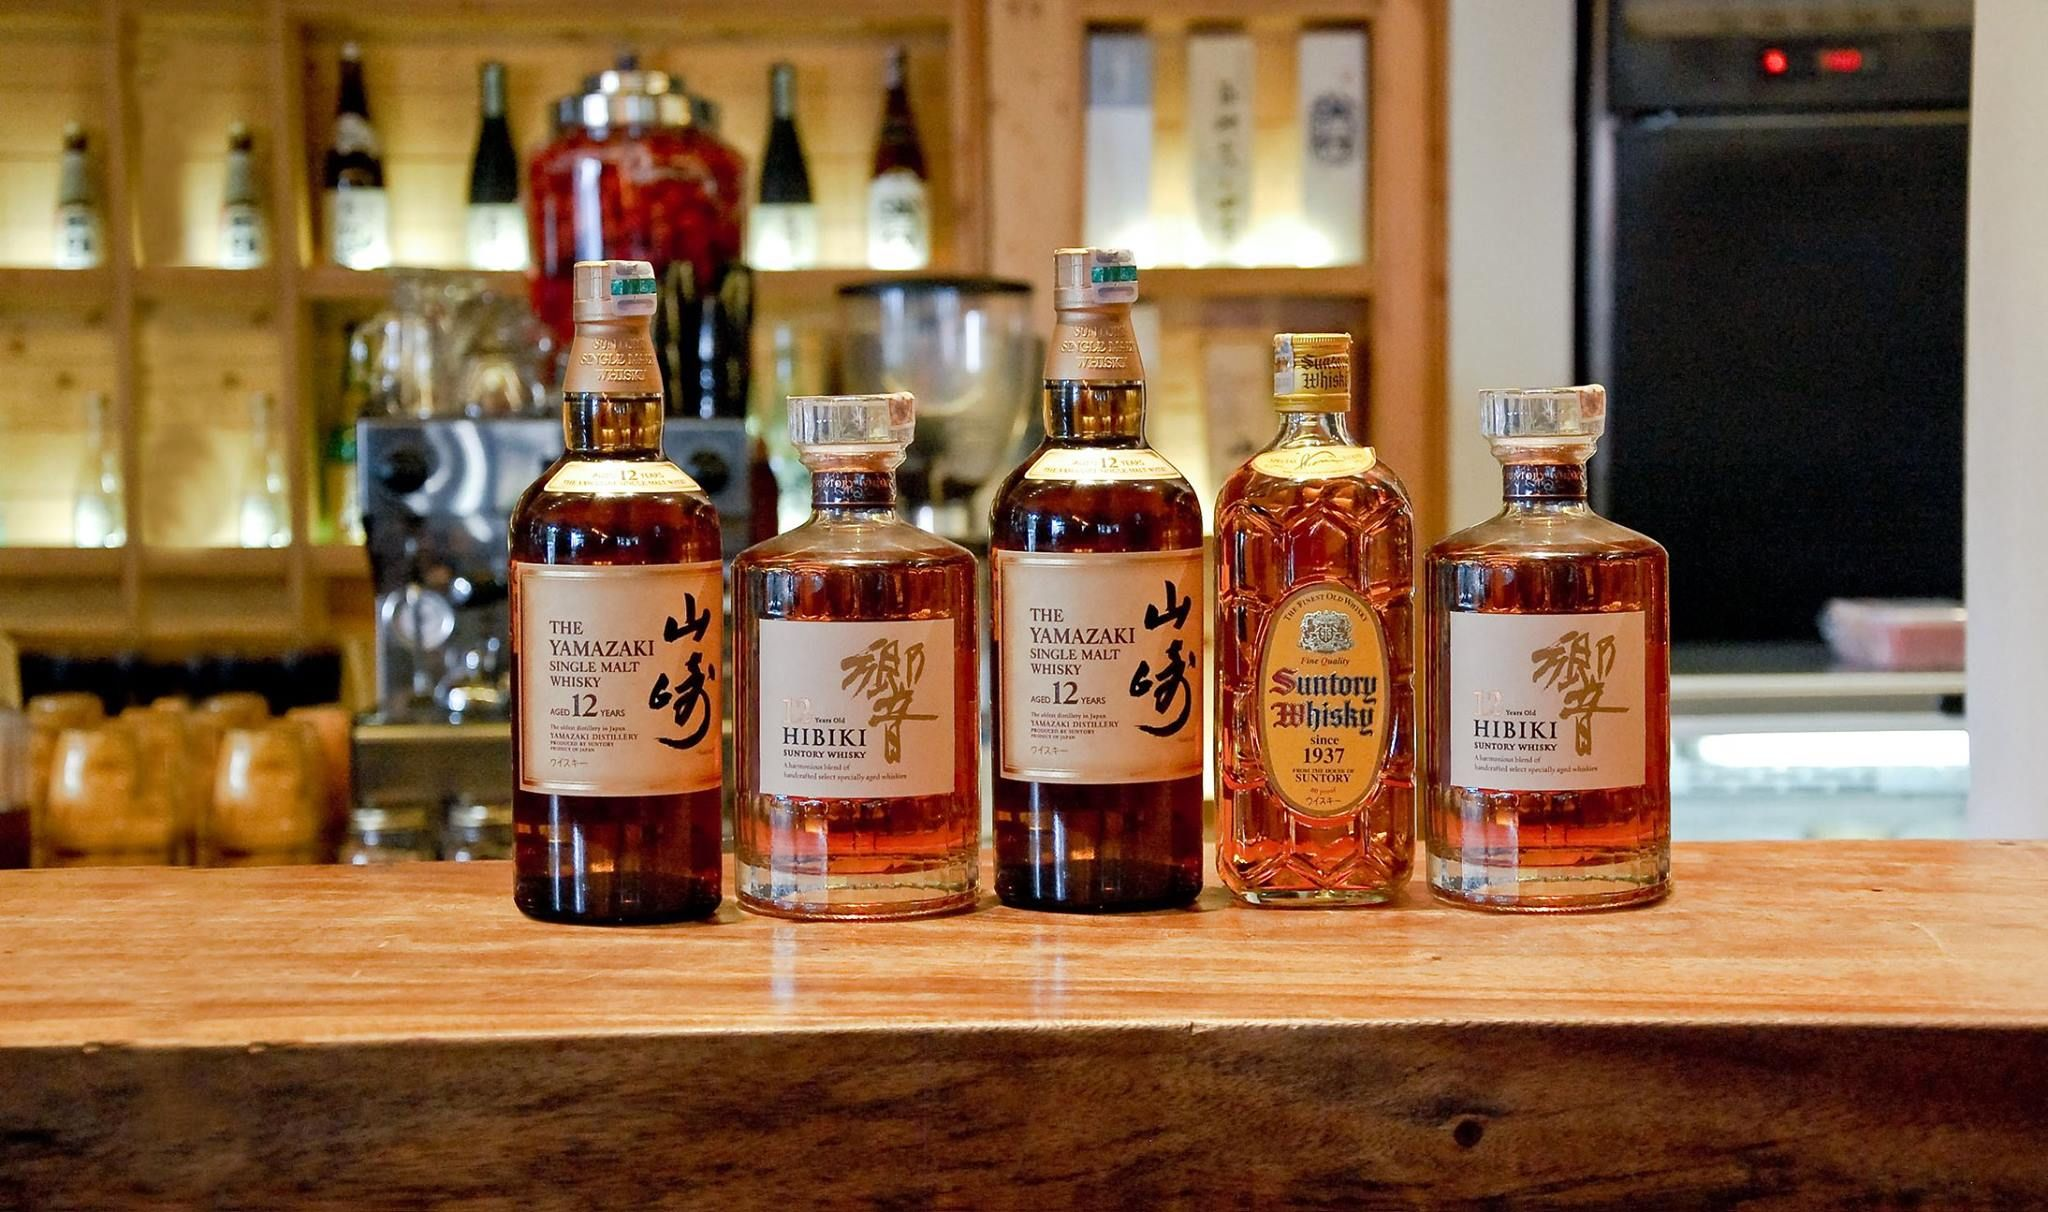 Sake and japanese beer #drinks #sake #japanesebeer #opcoindonesia #yellowfin https://www.facebook.com/yellowfinOPCO